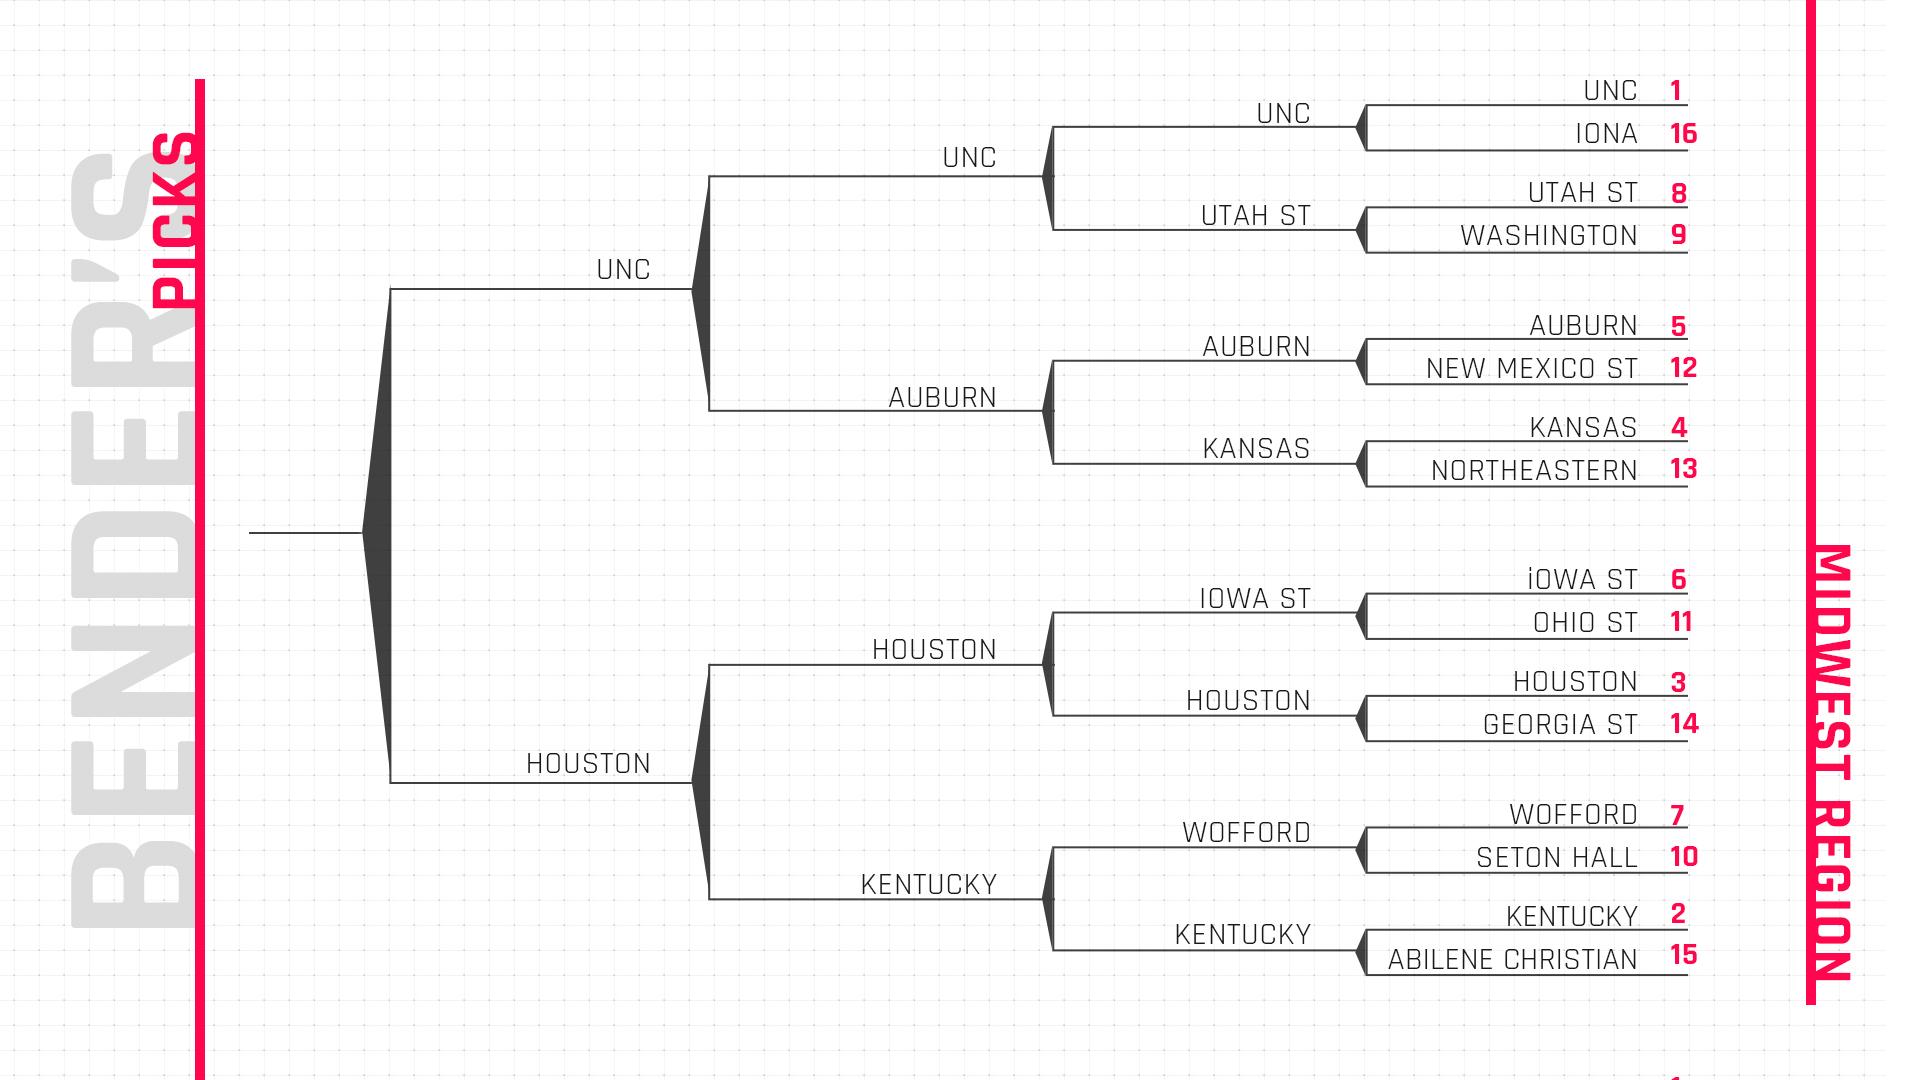 Tniaam S Ncaa Tournament Final Four Picks And Predicting: March Madness Bracket 2019: Bill Bender's Expert NCAA